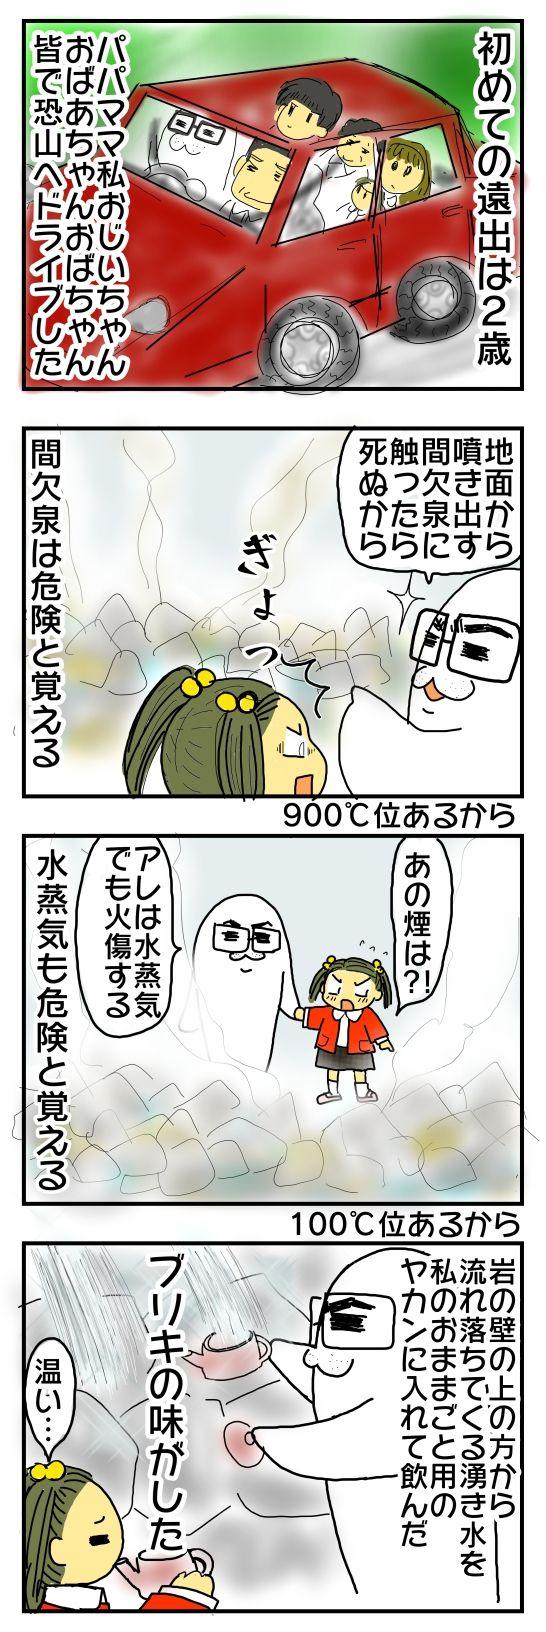 30x45-3